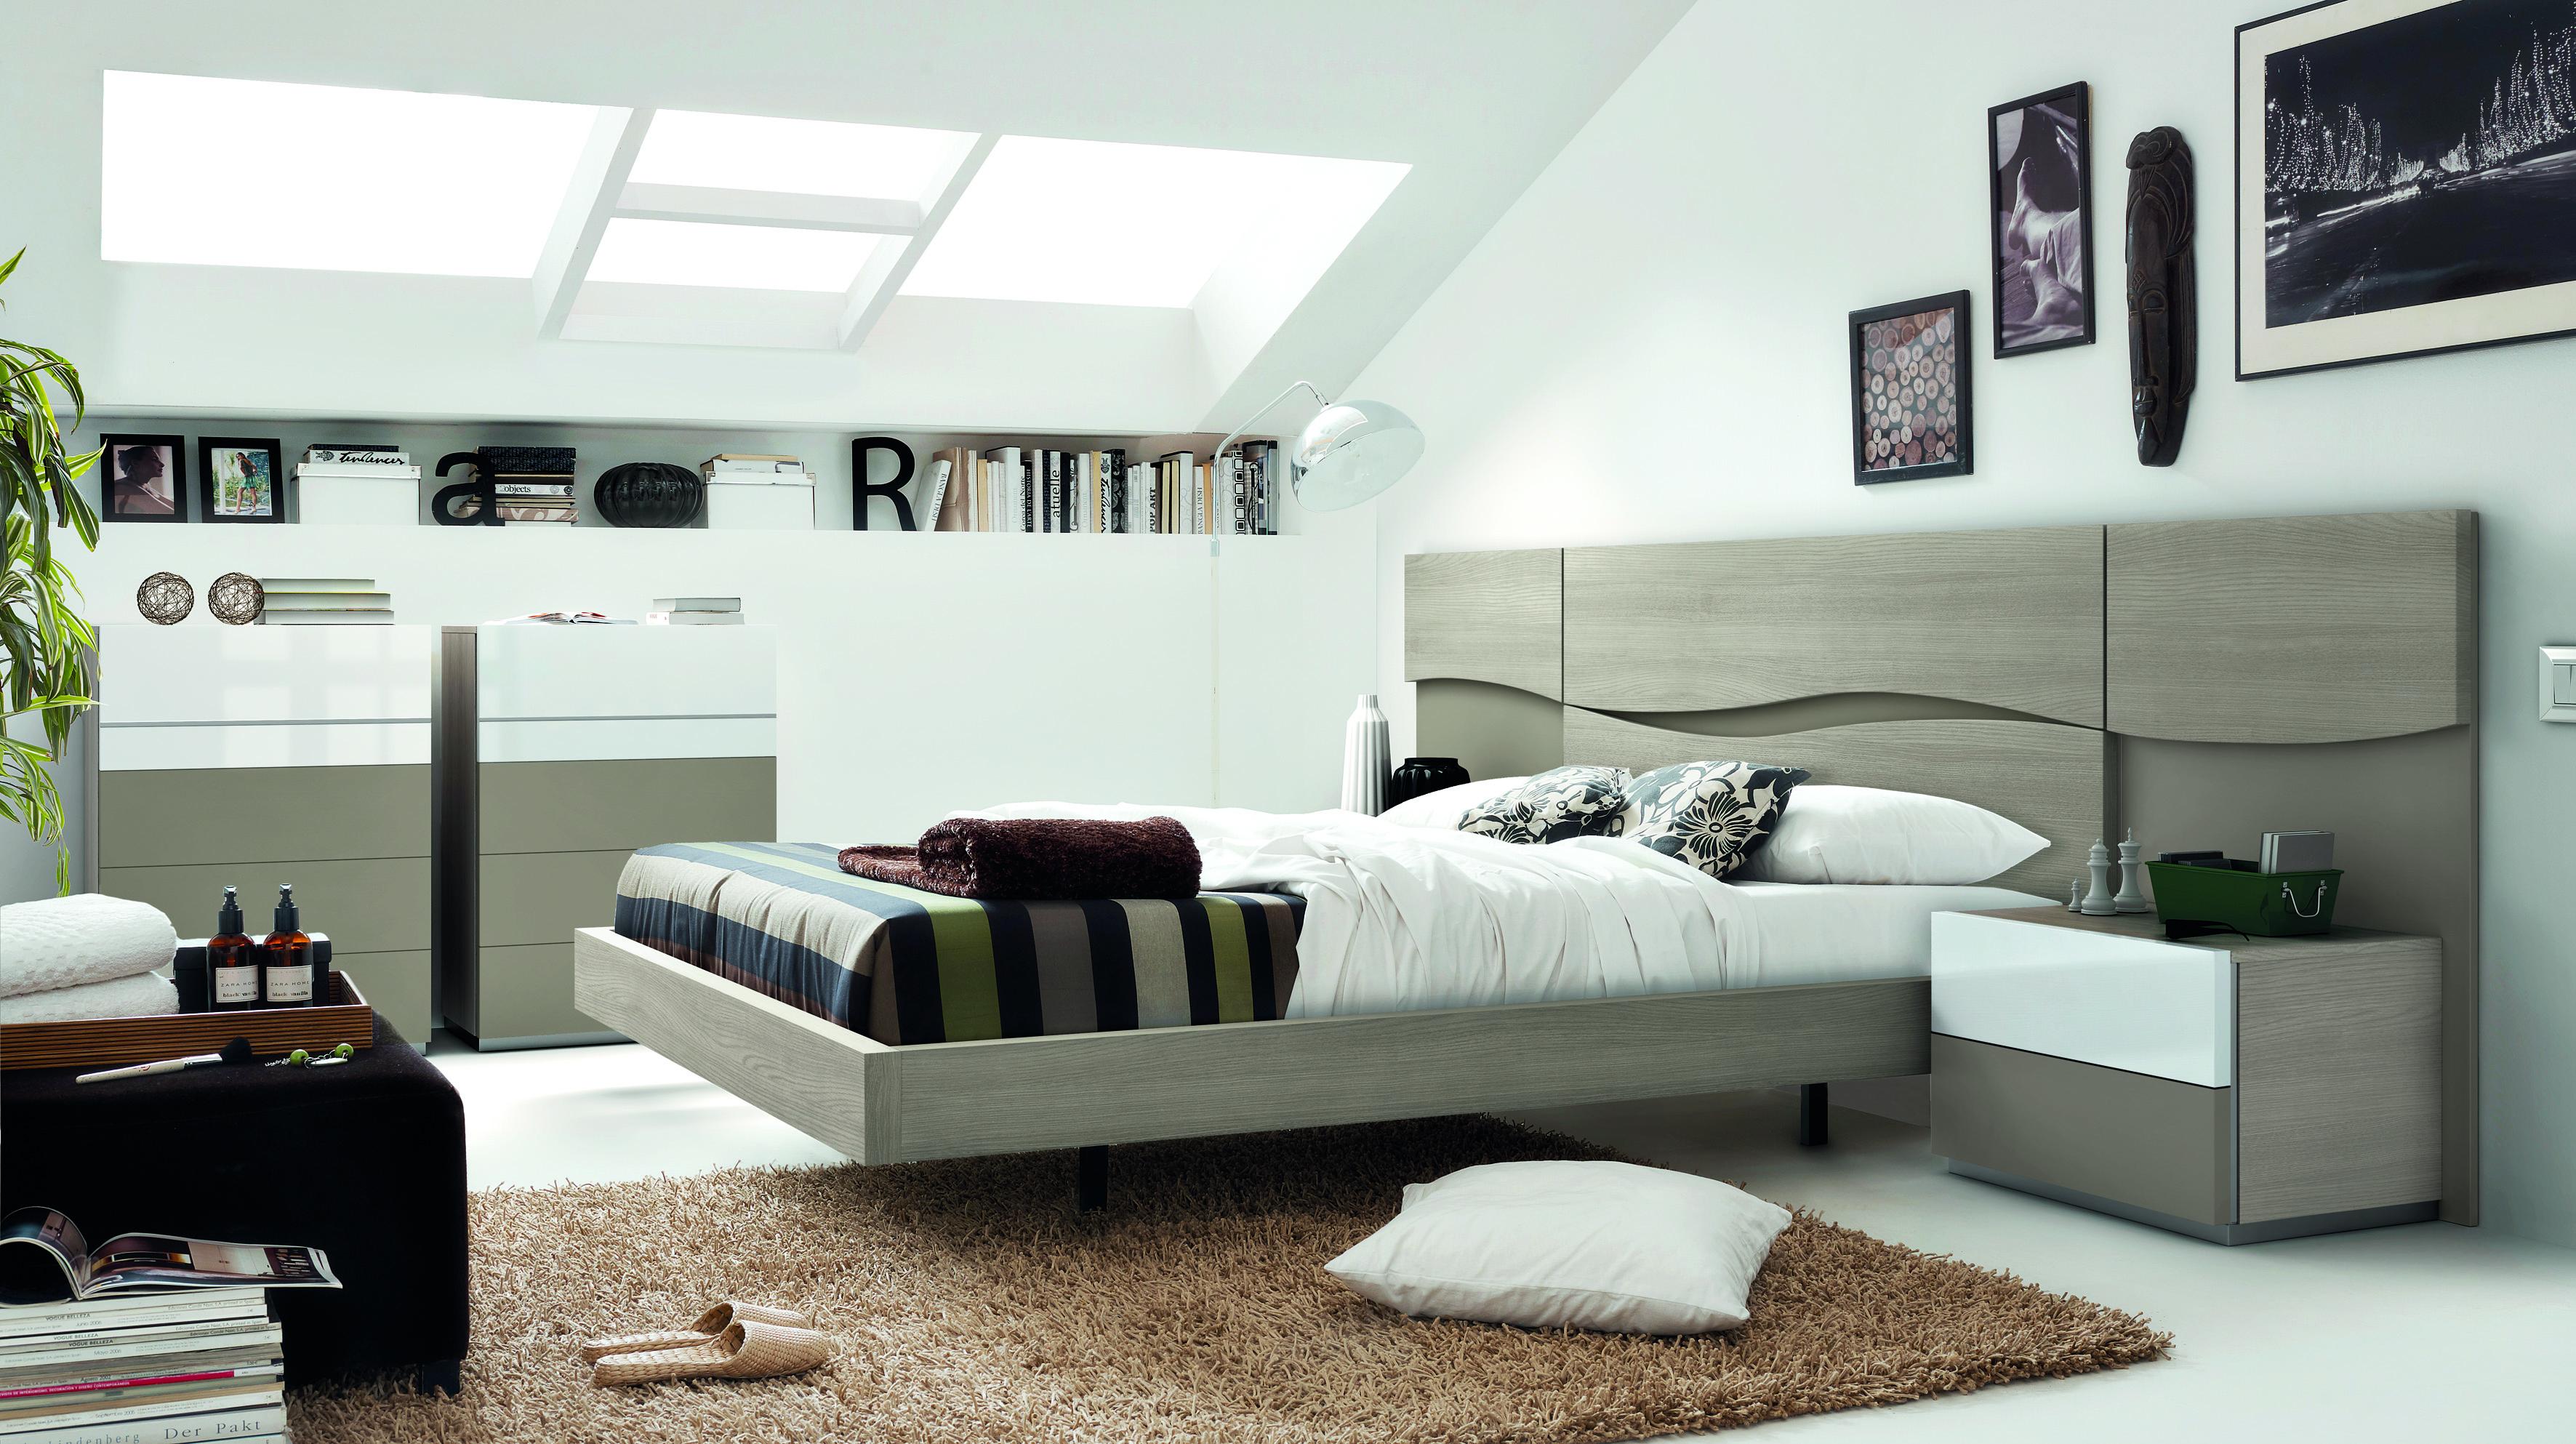 02_dormitorio_moderno